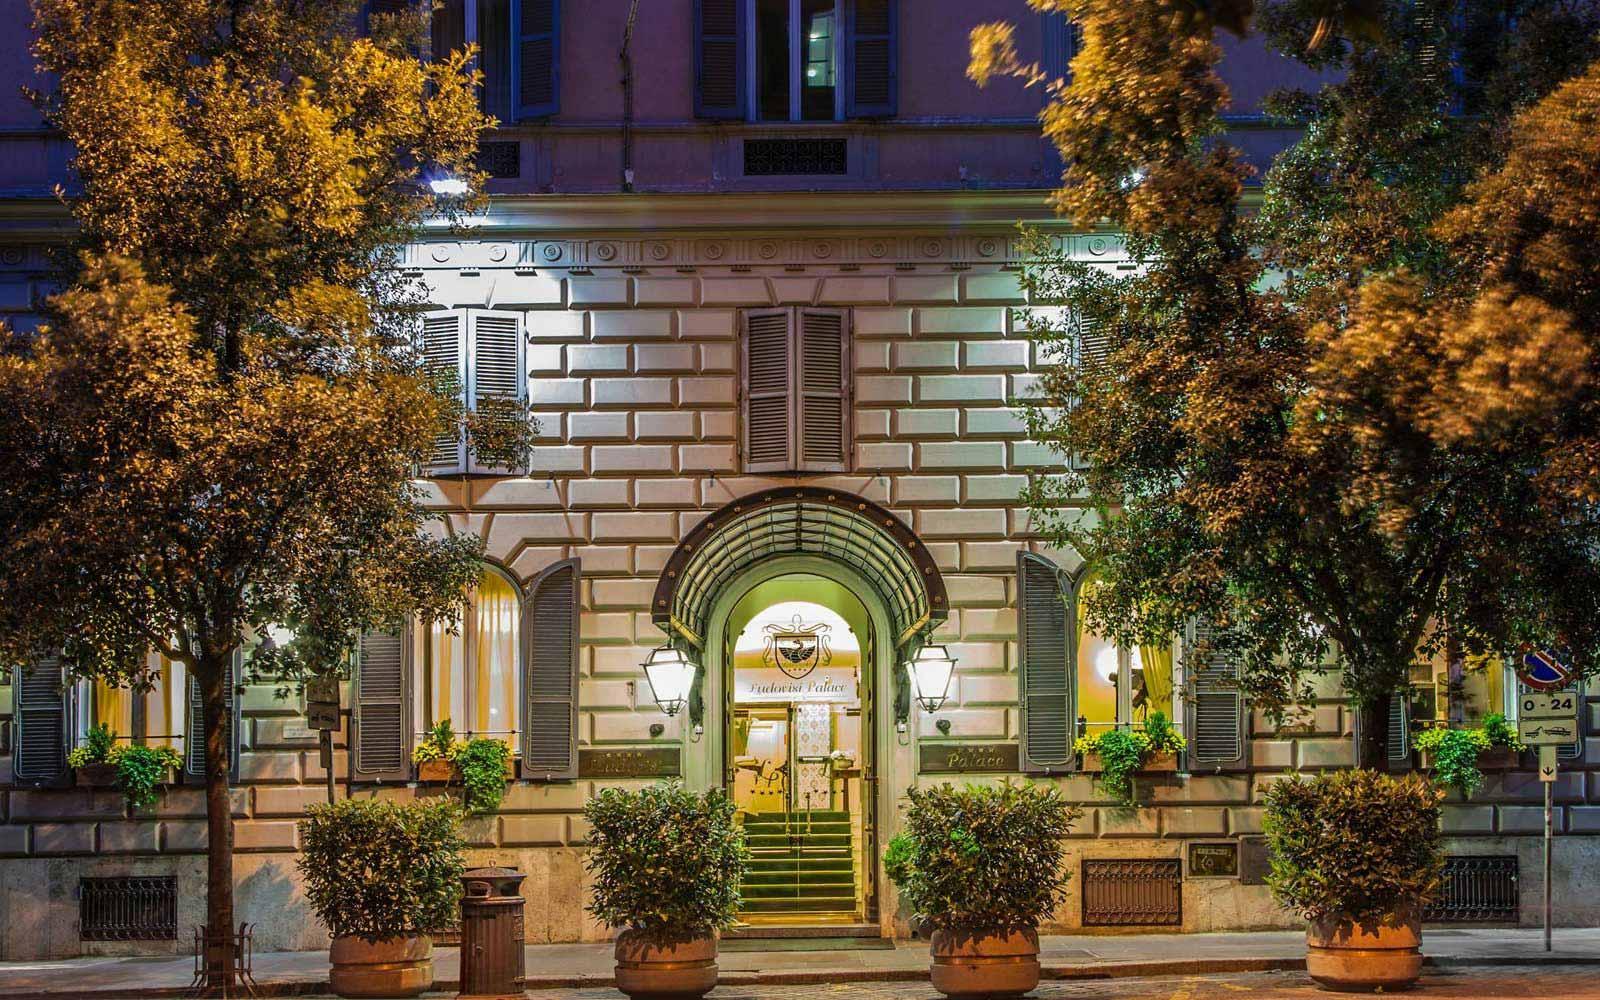 Main entrance at Hotel Ludovisi Palace